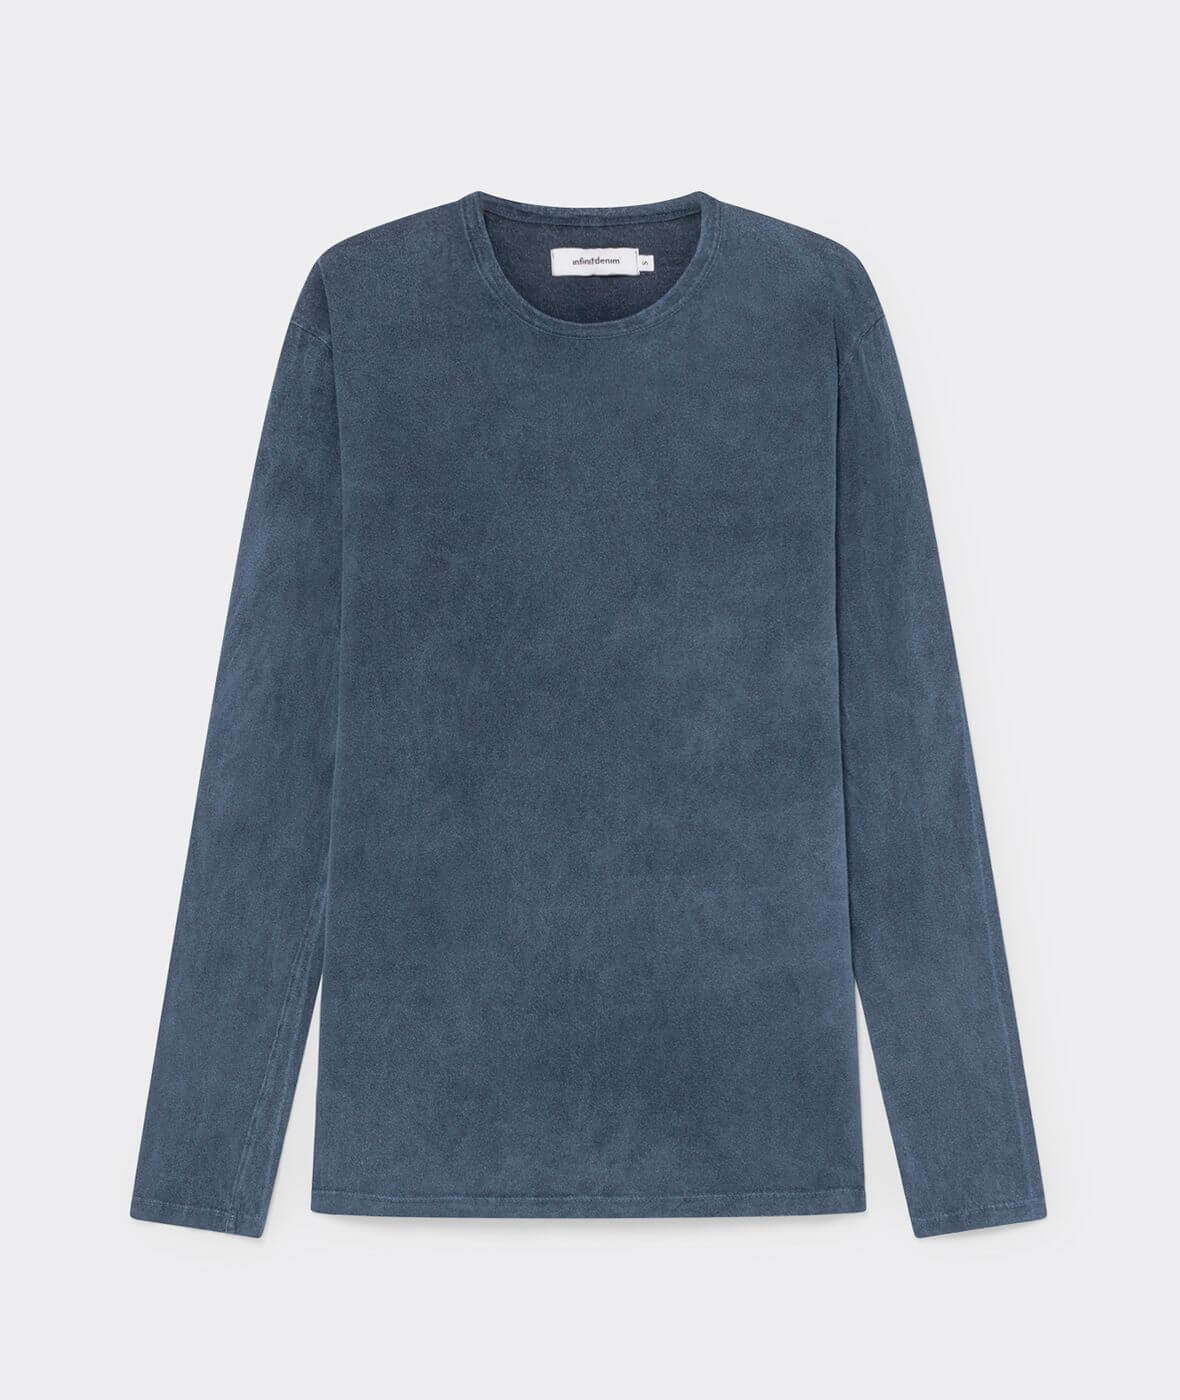 camiseta azul manga larga algodón orgánico